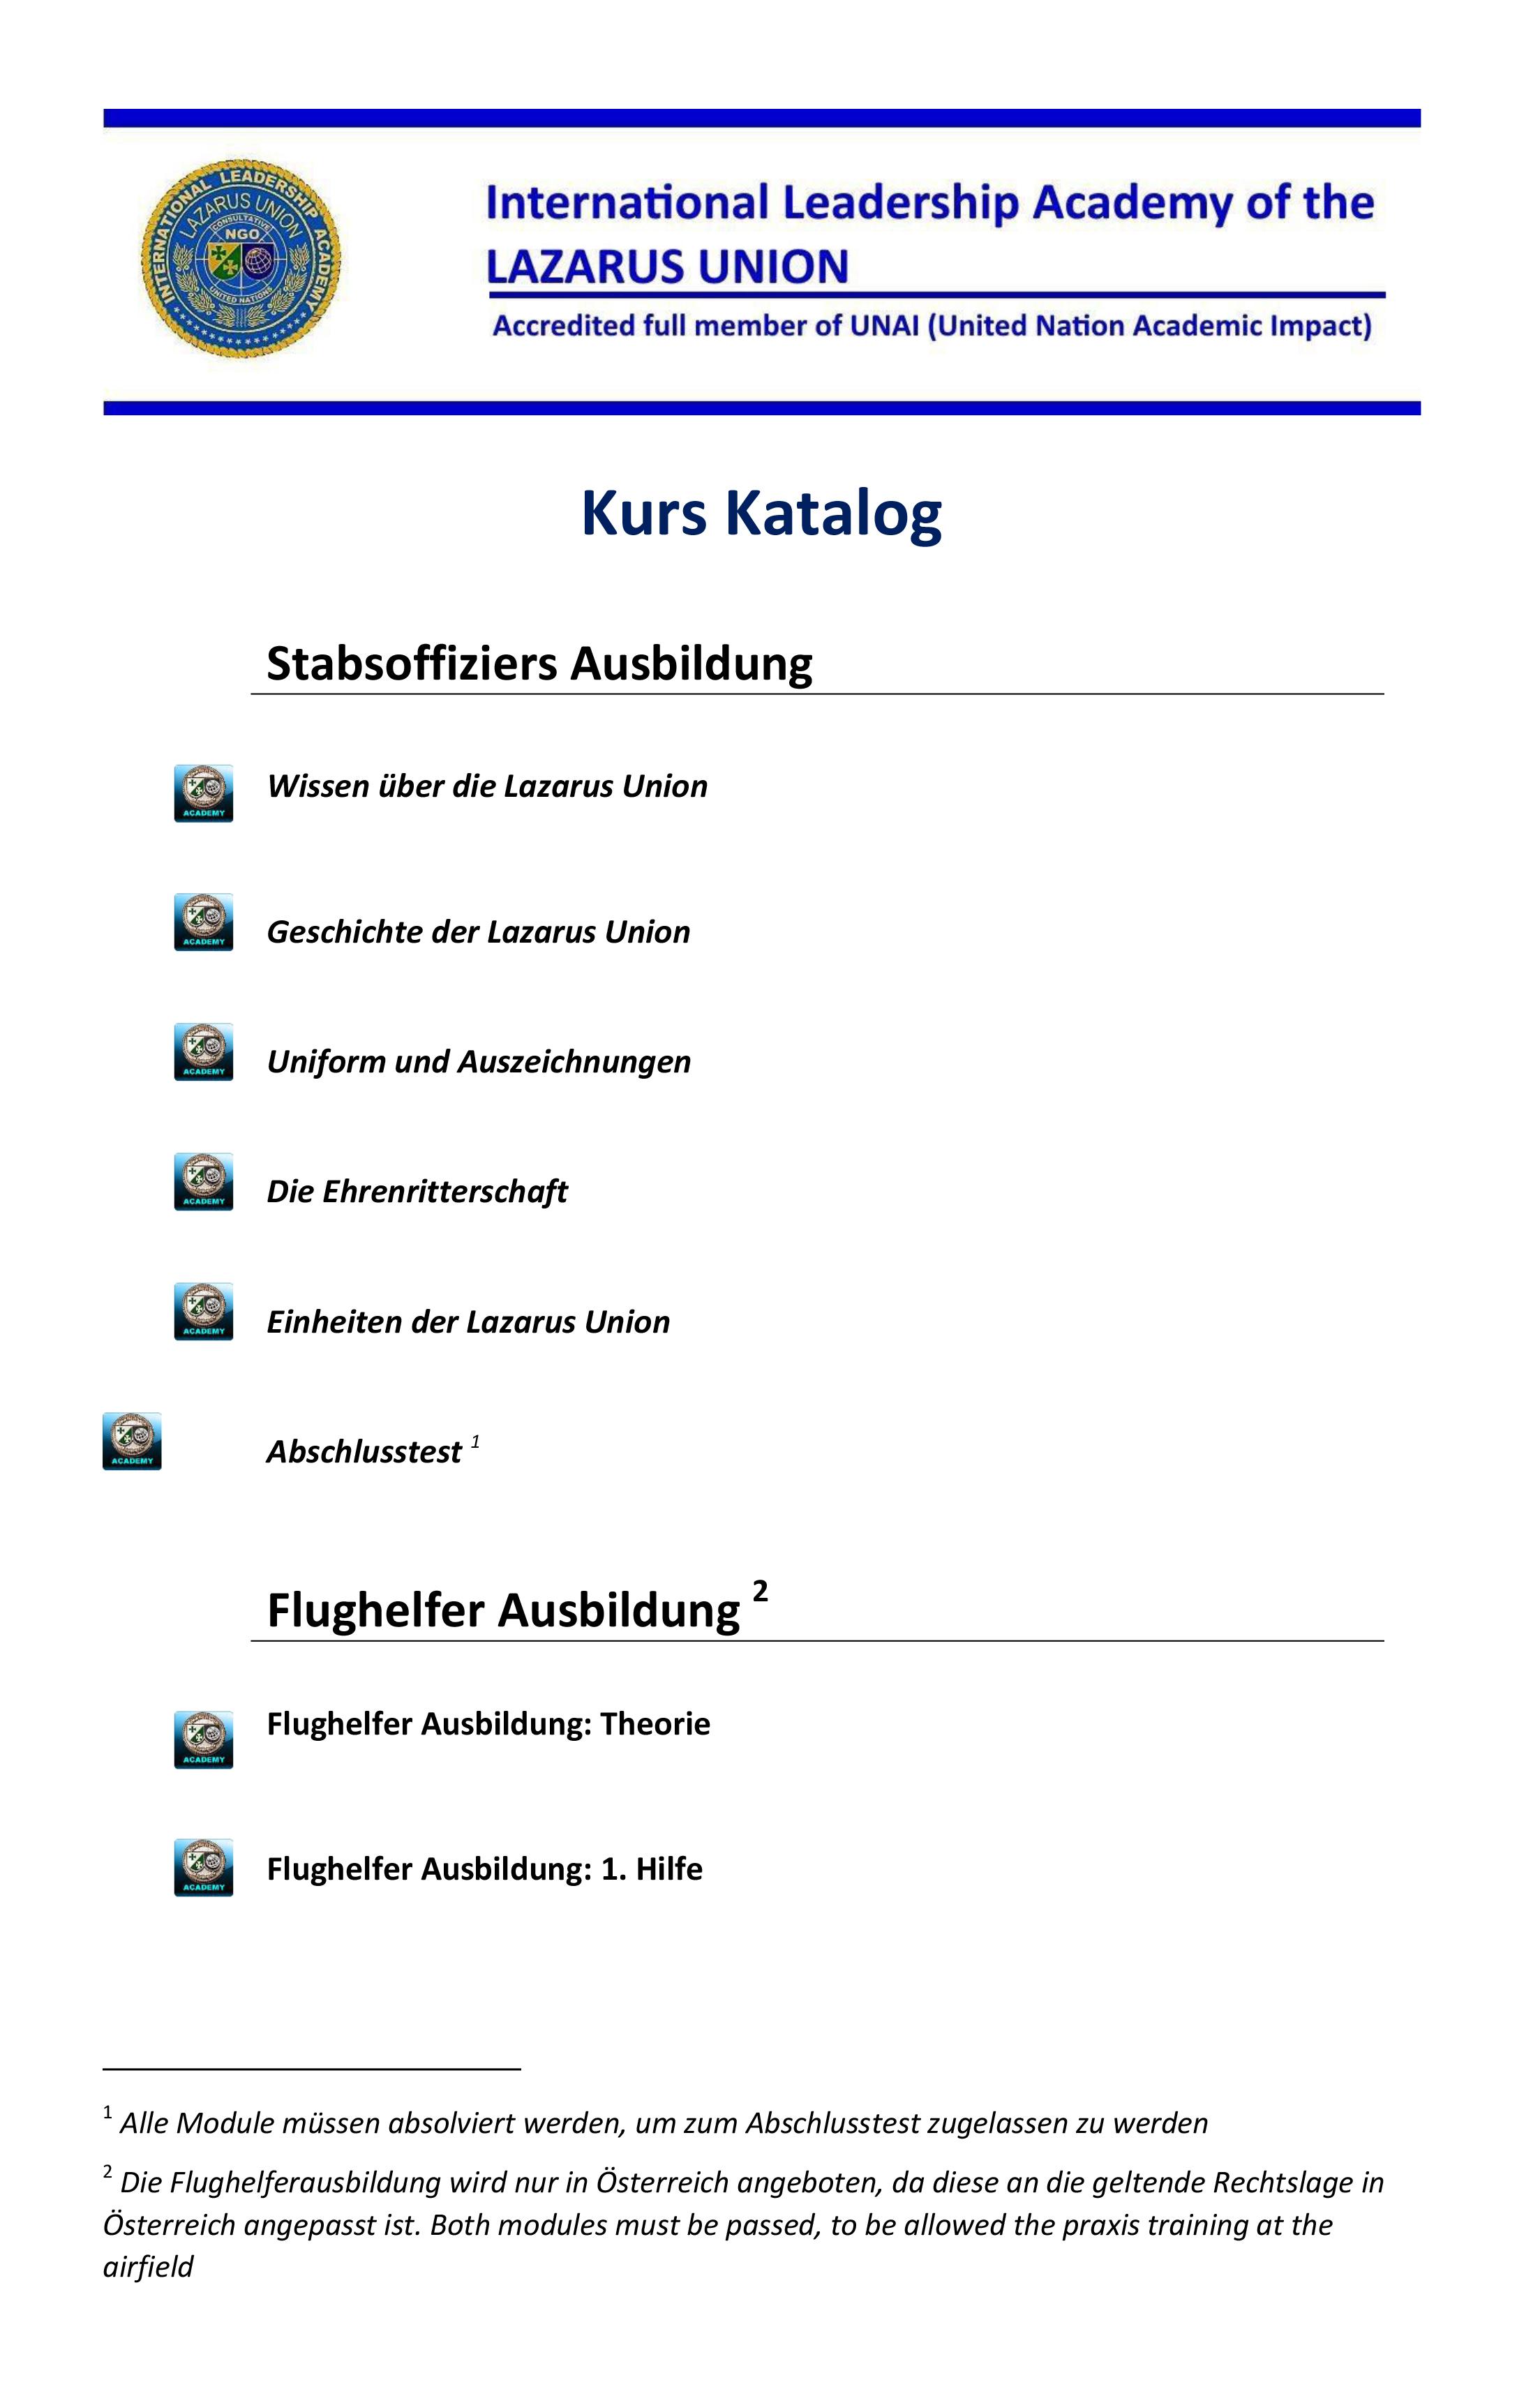 Kurs Katalog